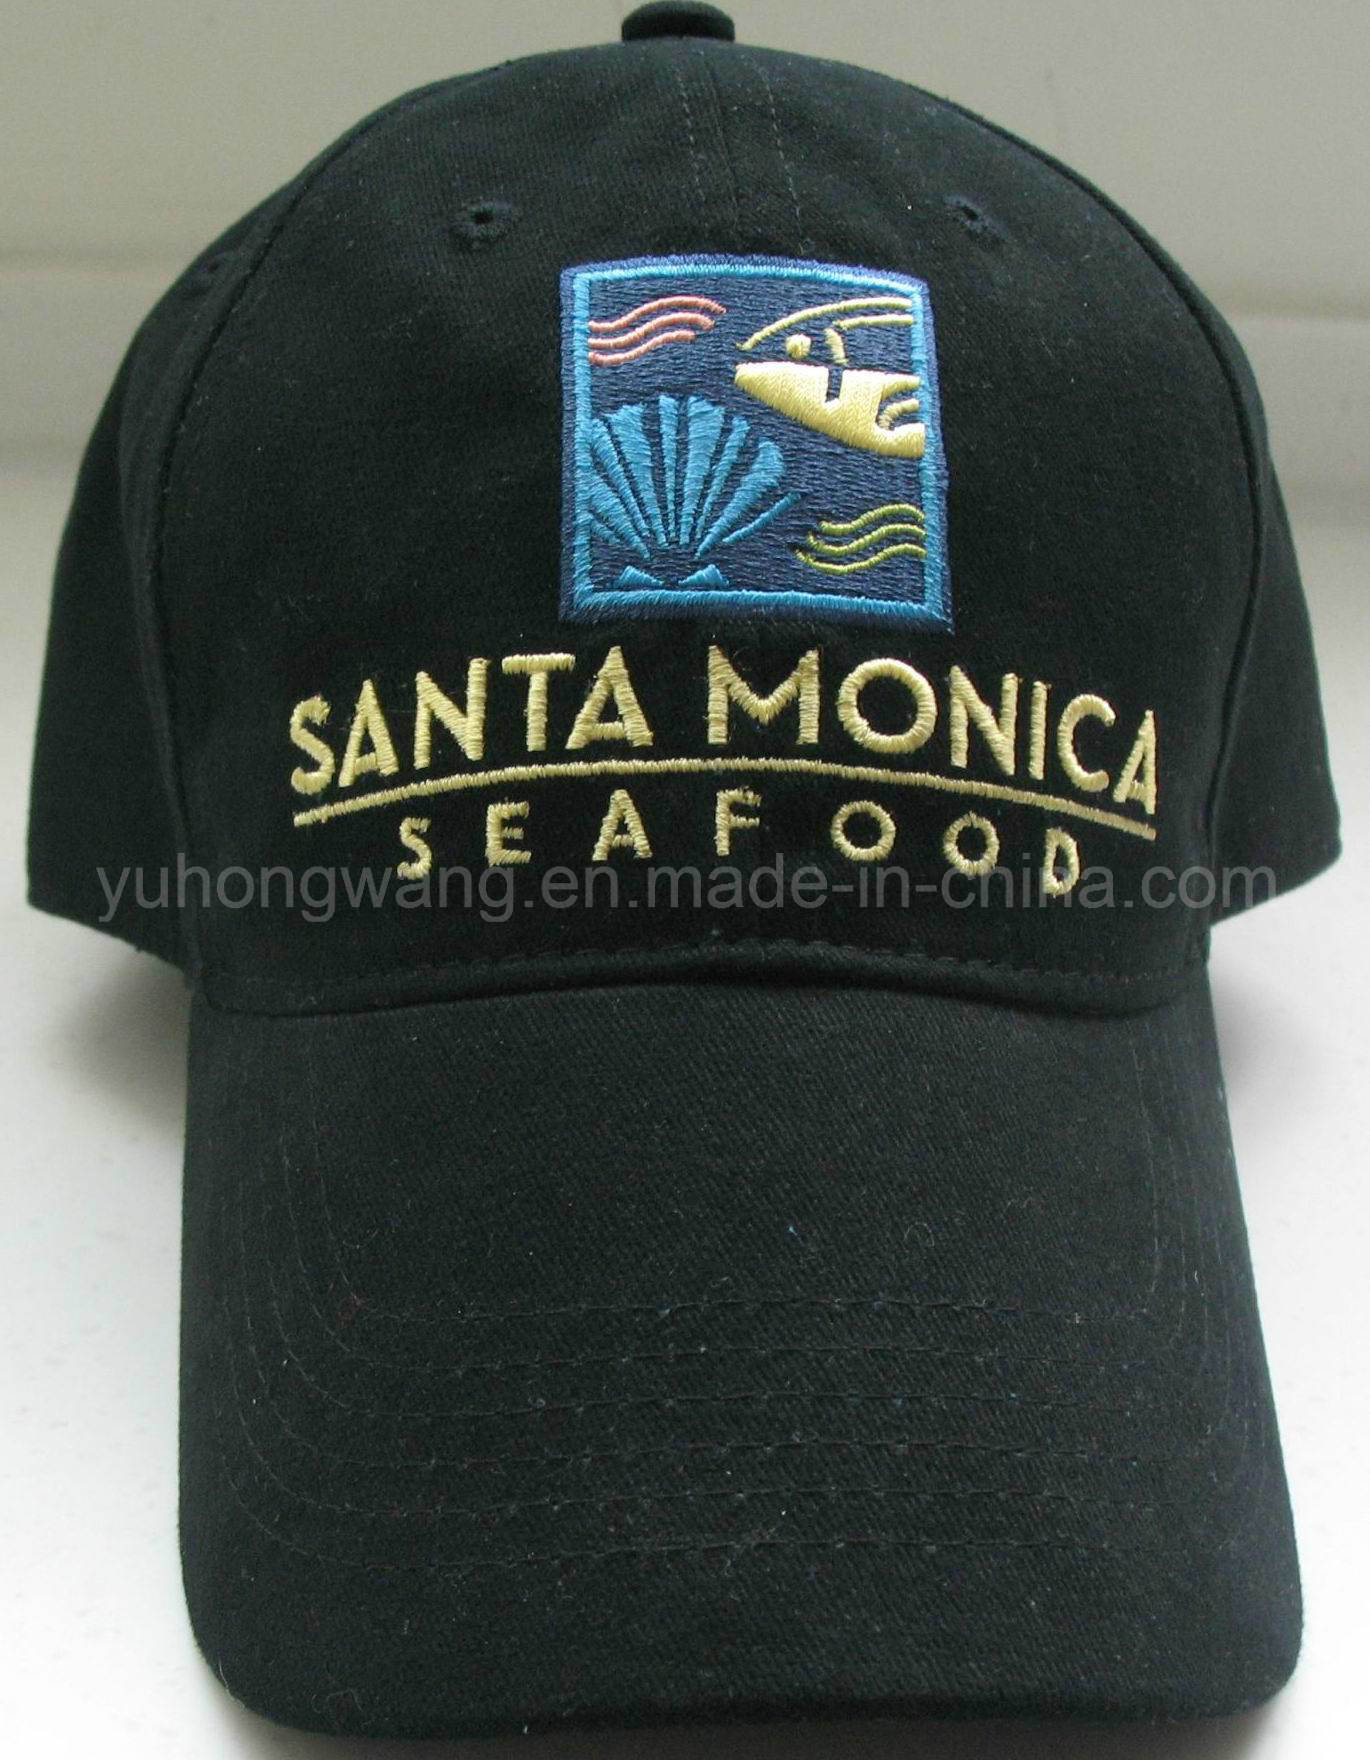 Customized Sports Baseball Hat, Snapback Cap